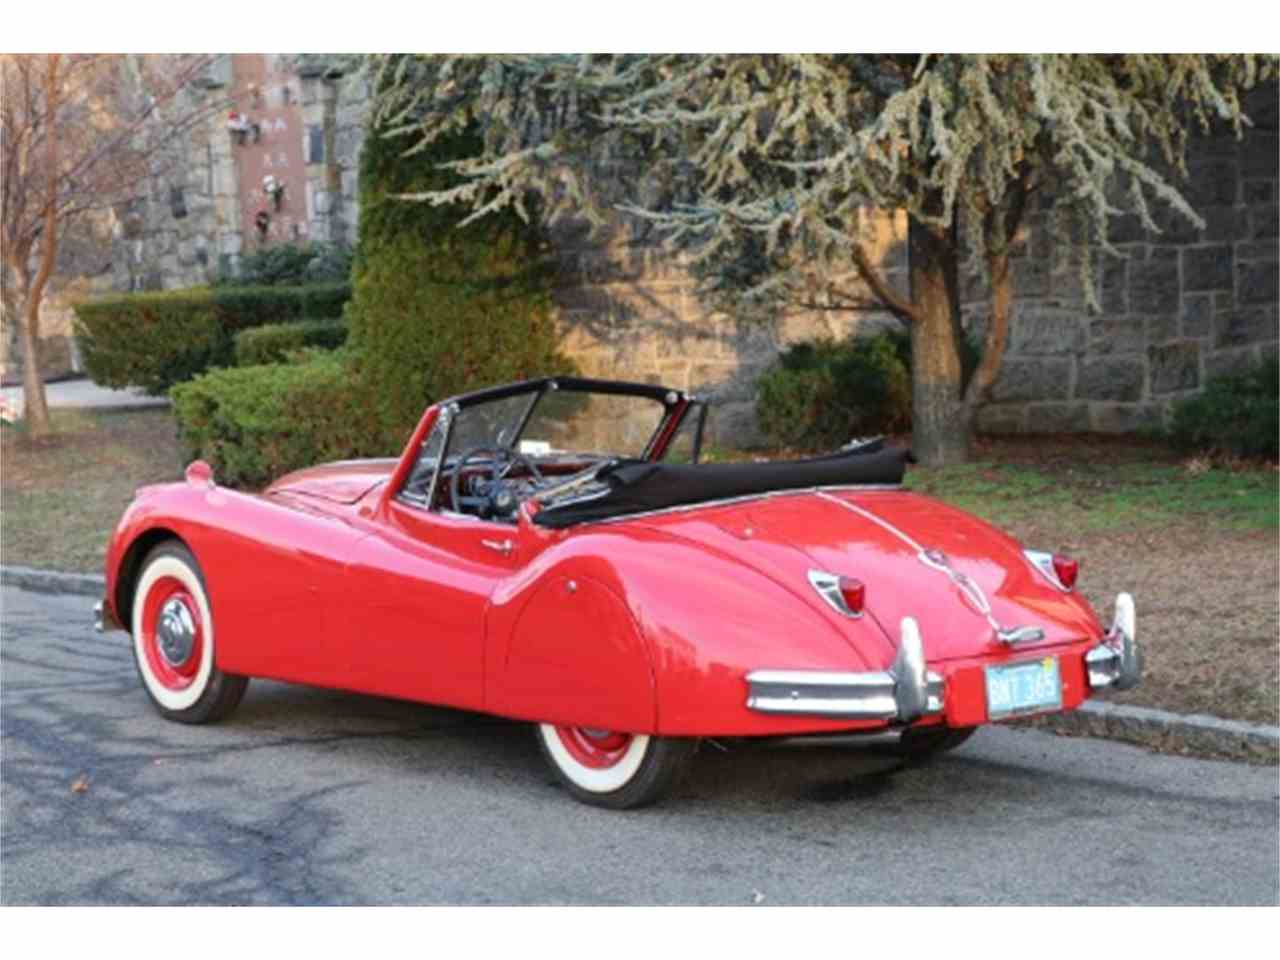 closed on img roadster mc a bring sale bat jaguar auctions lot december listing trailer for